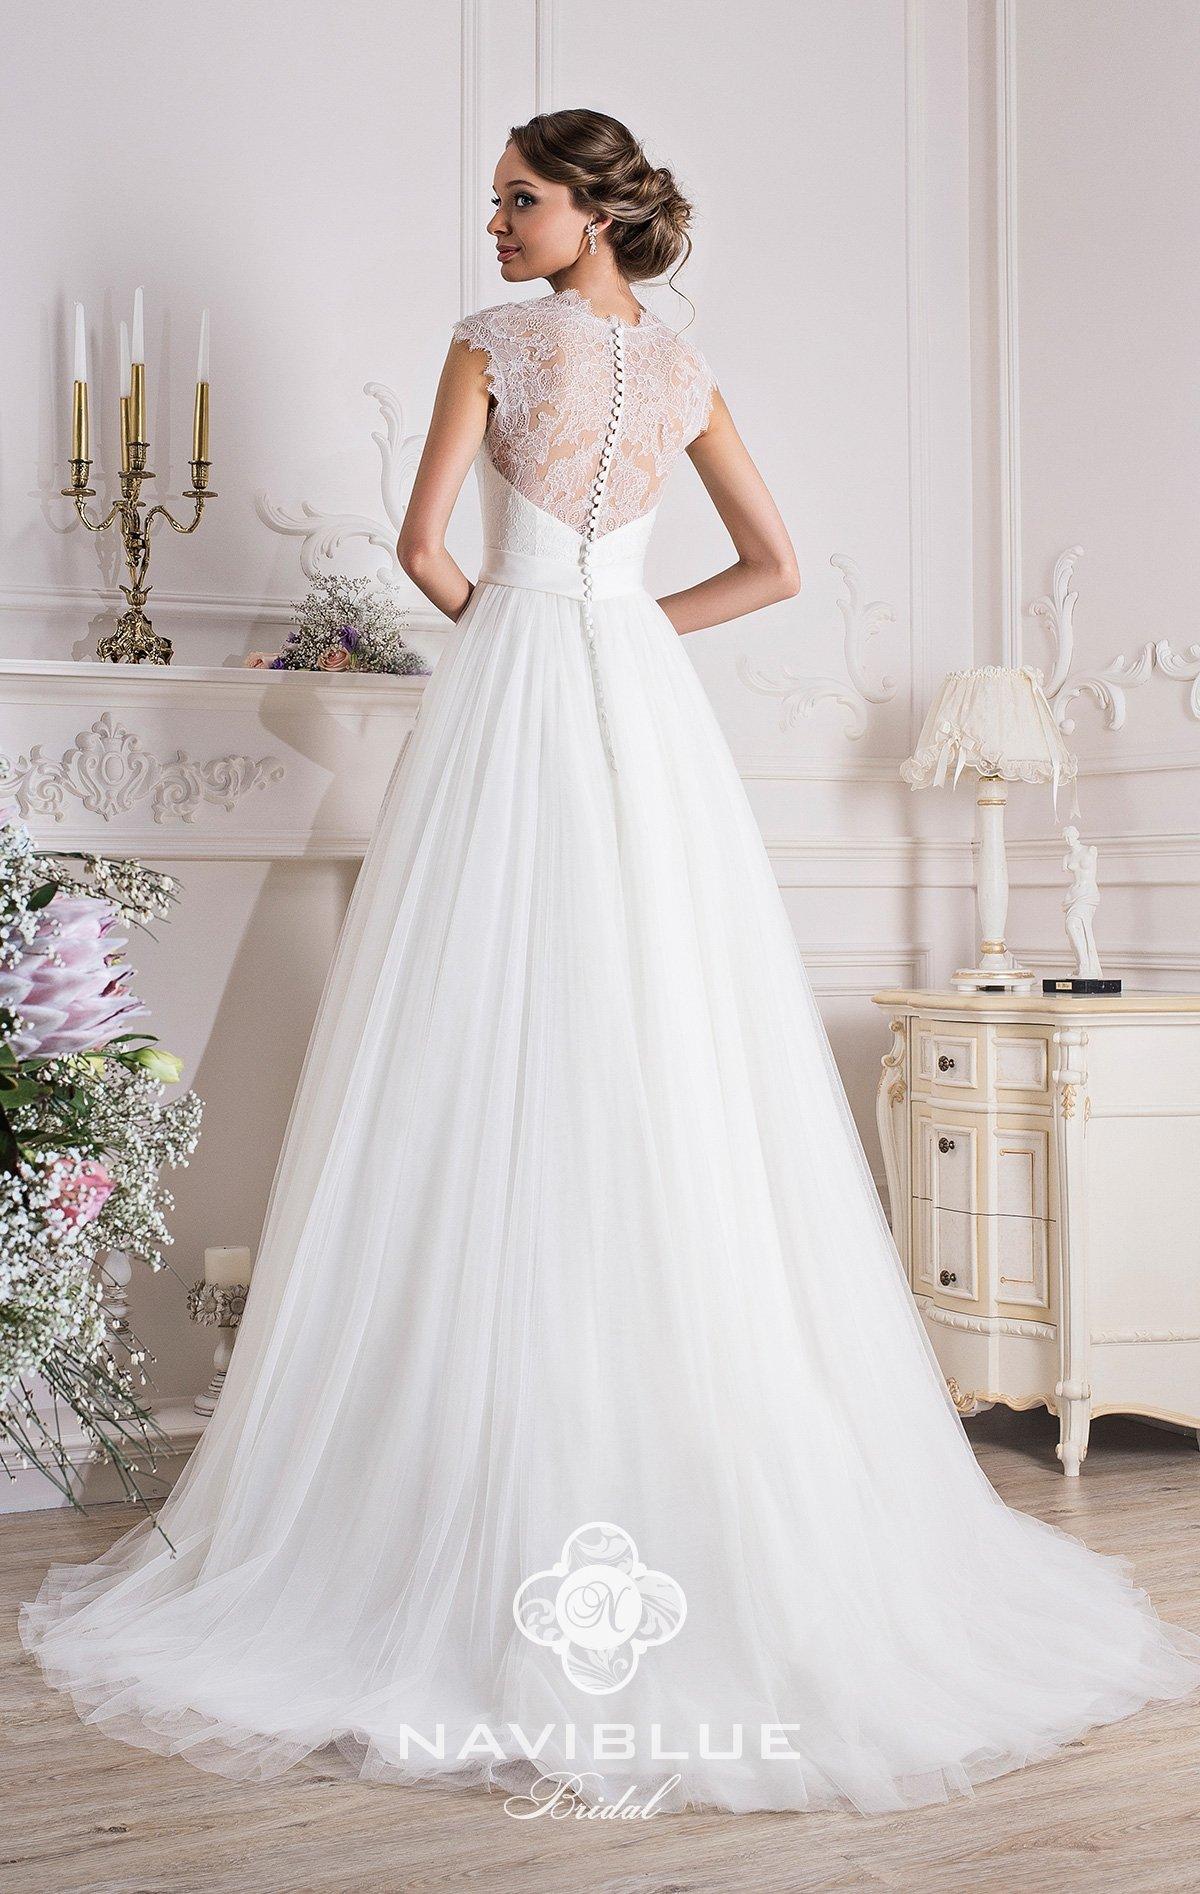 naviblue-bridal-13103_0 (1)